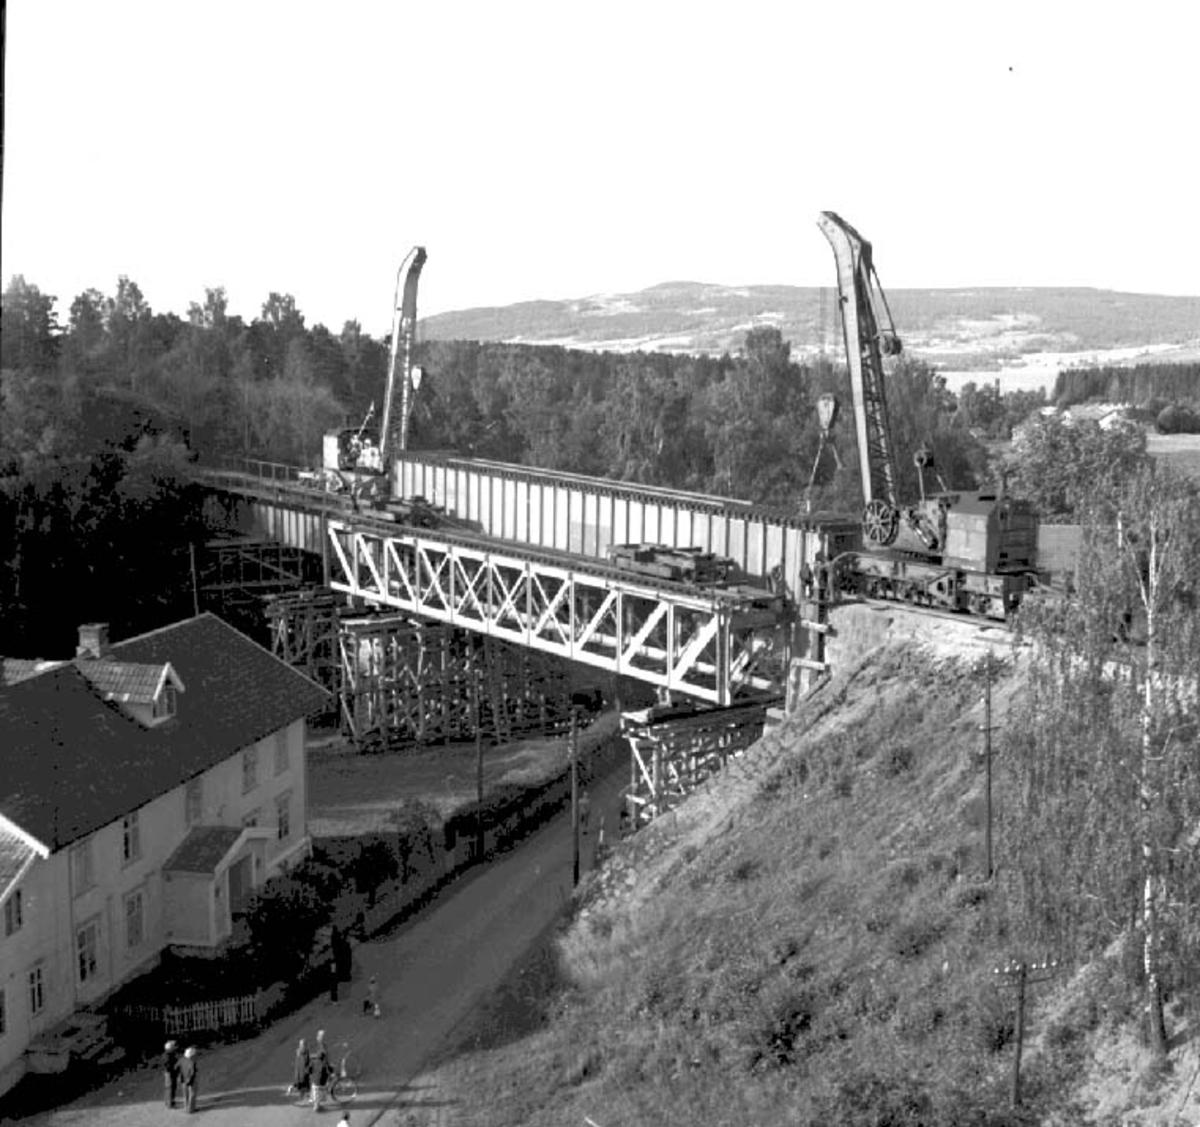 MOELVEN, BRU OVER MOELVA, SPENN 2, JERNBANEBRU, 24-7-1956